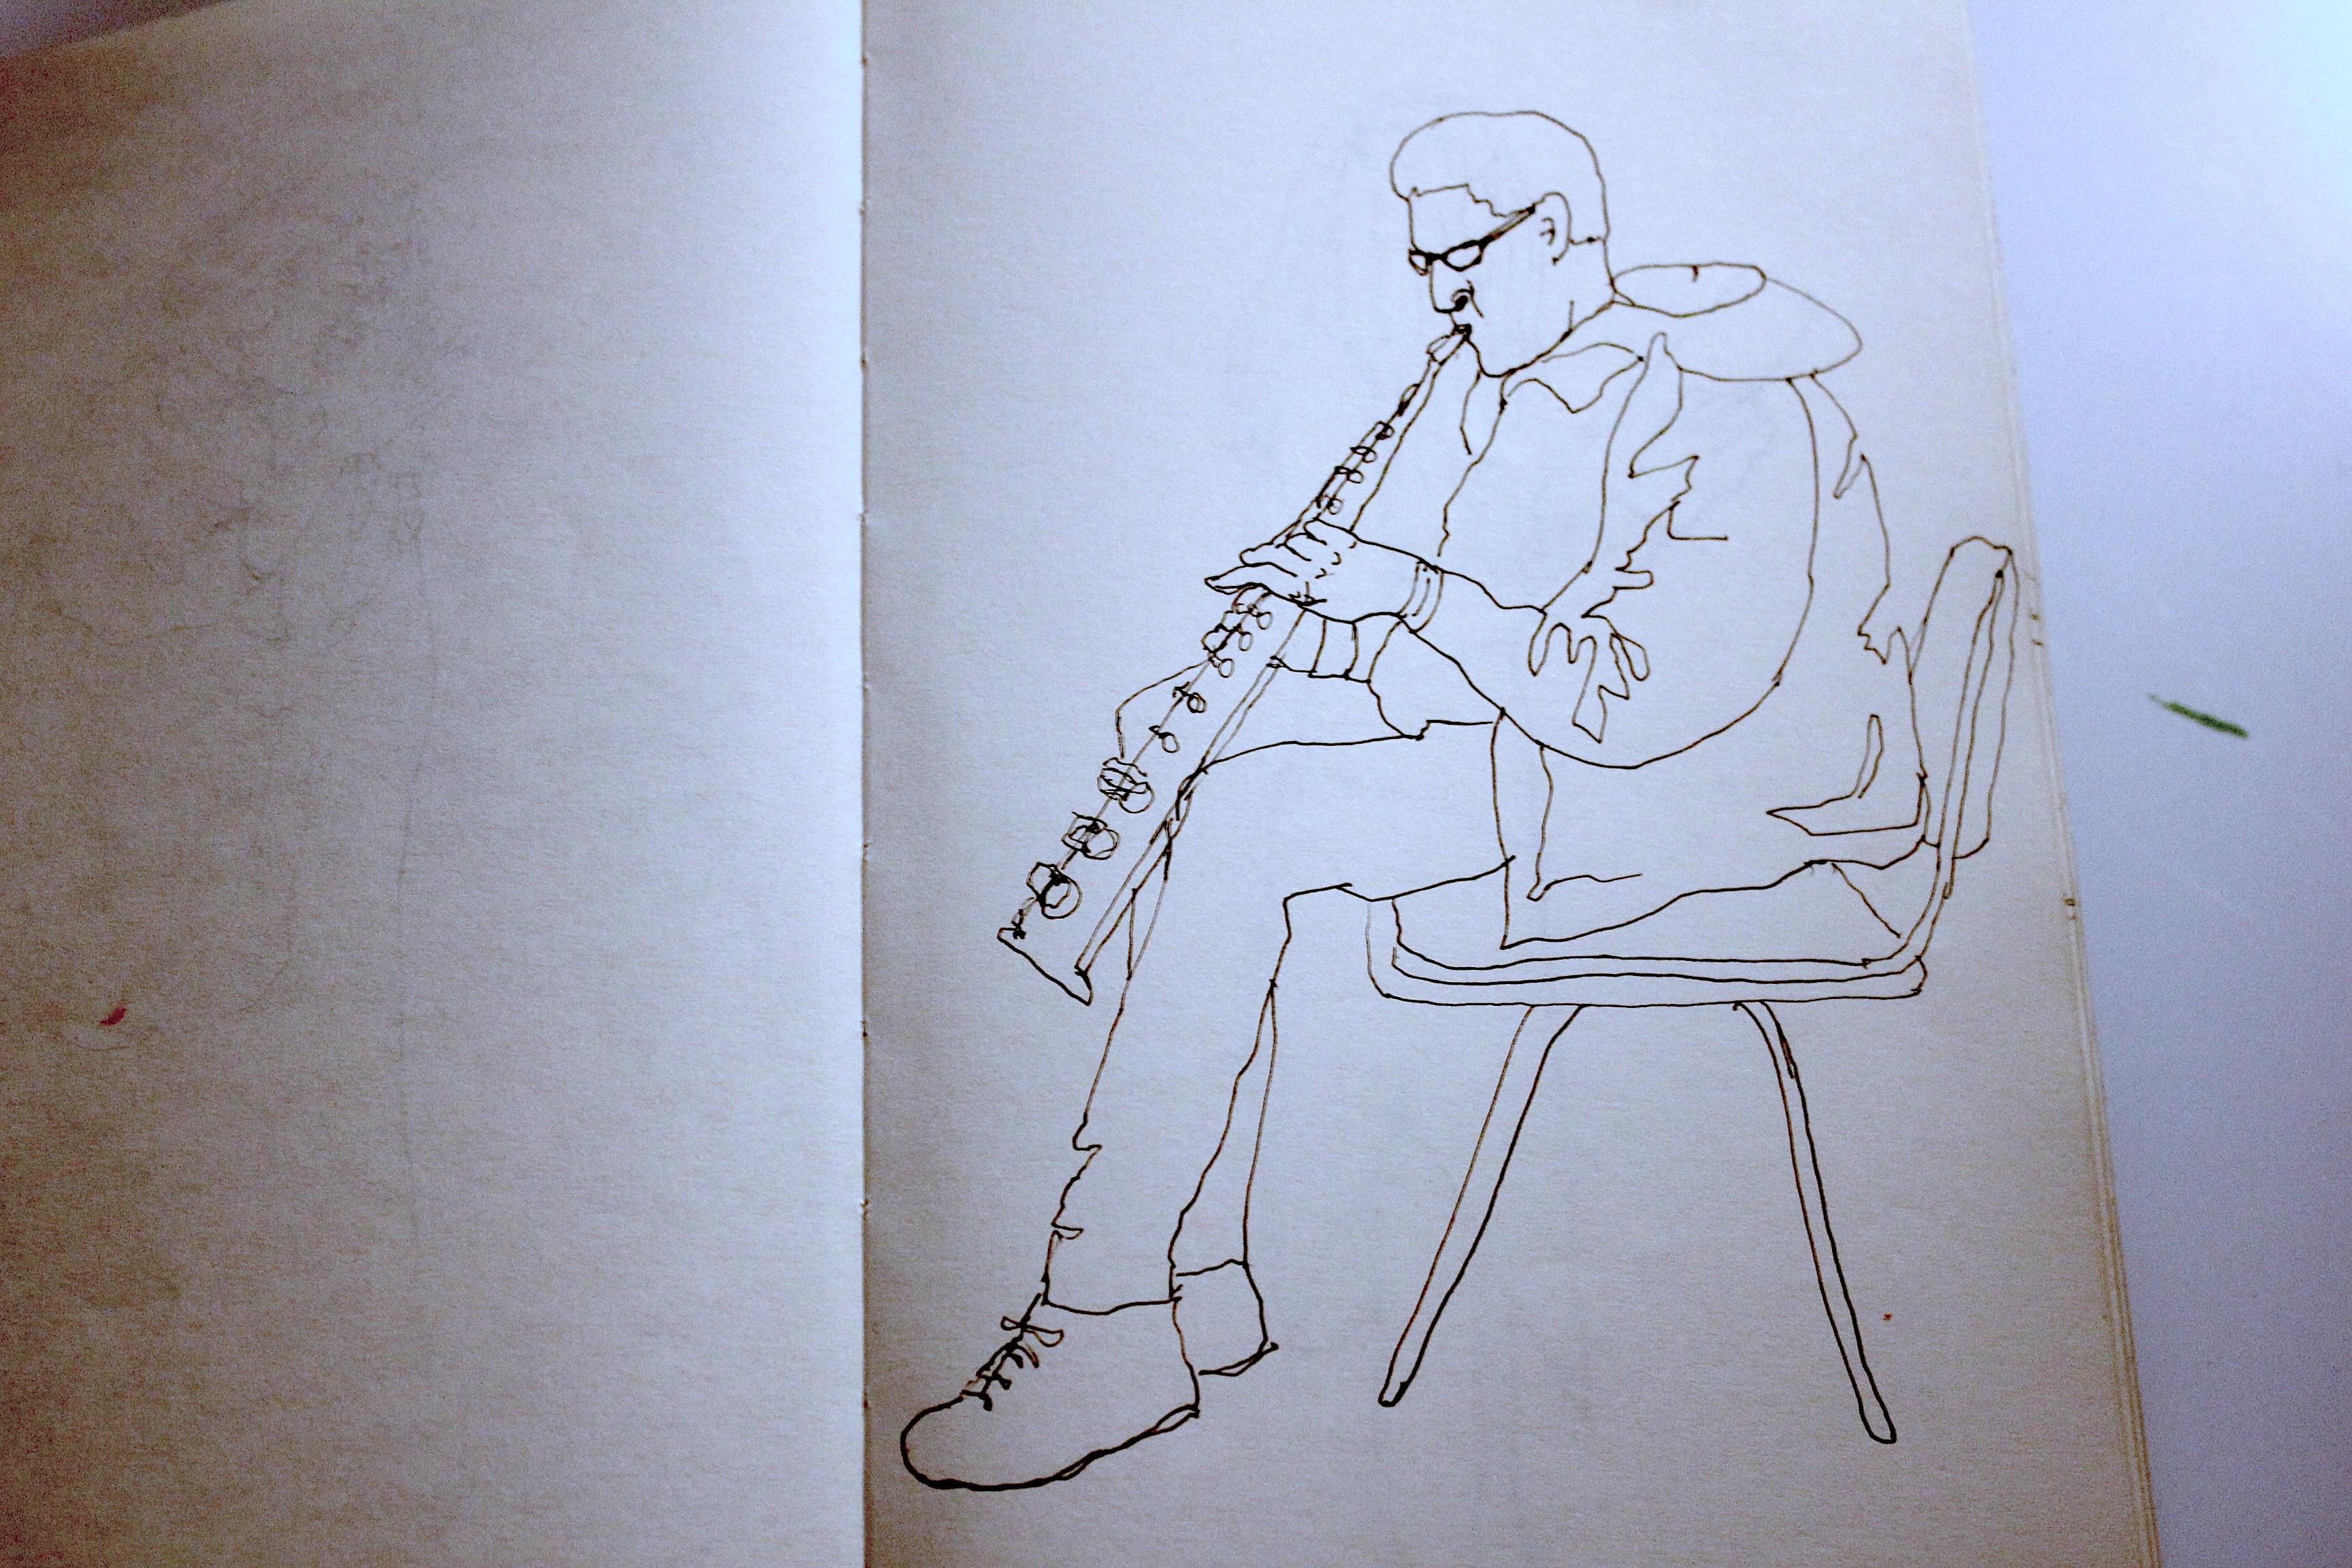 Clarinet player at Safehouse, Brighton